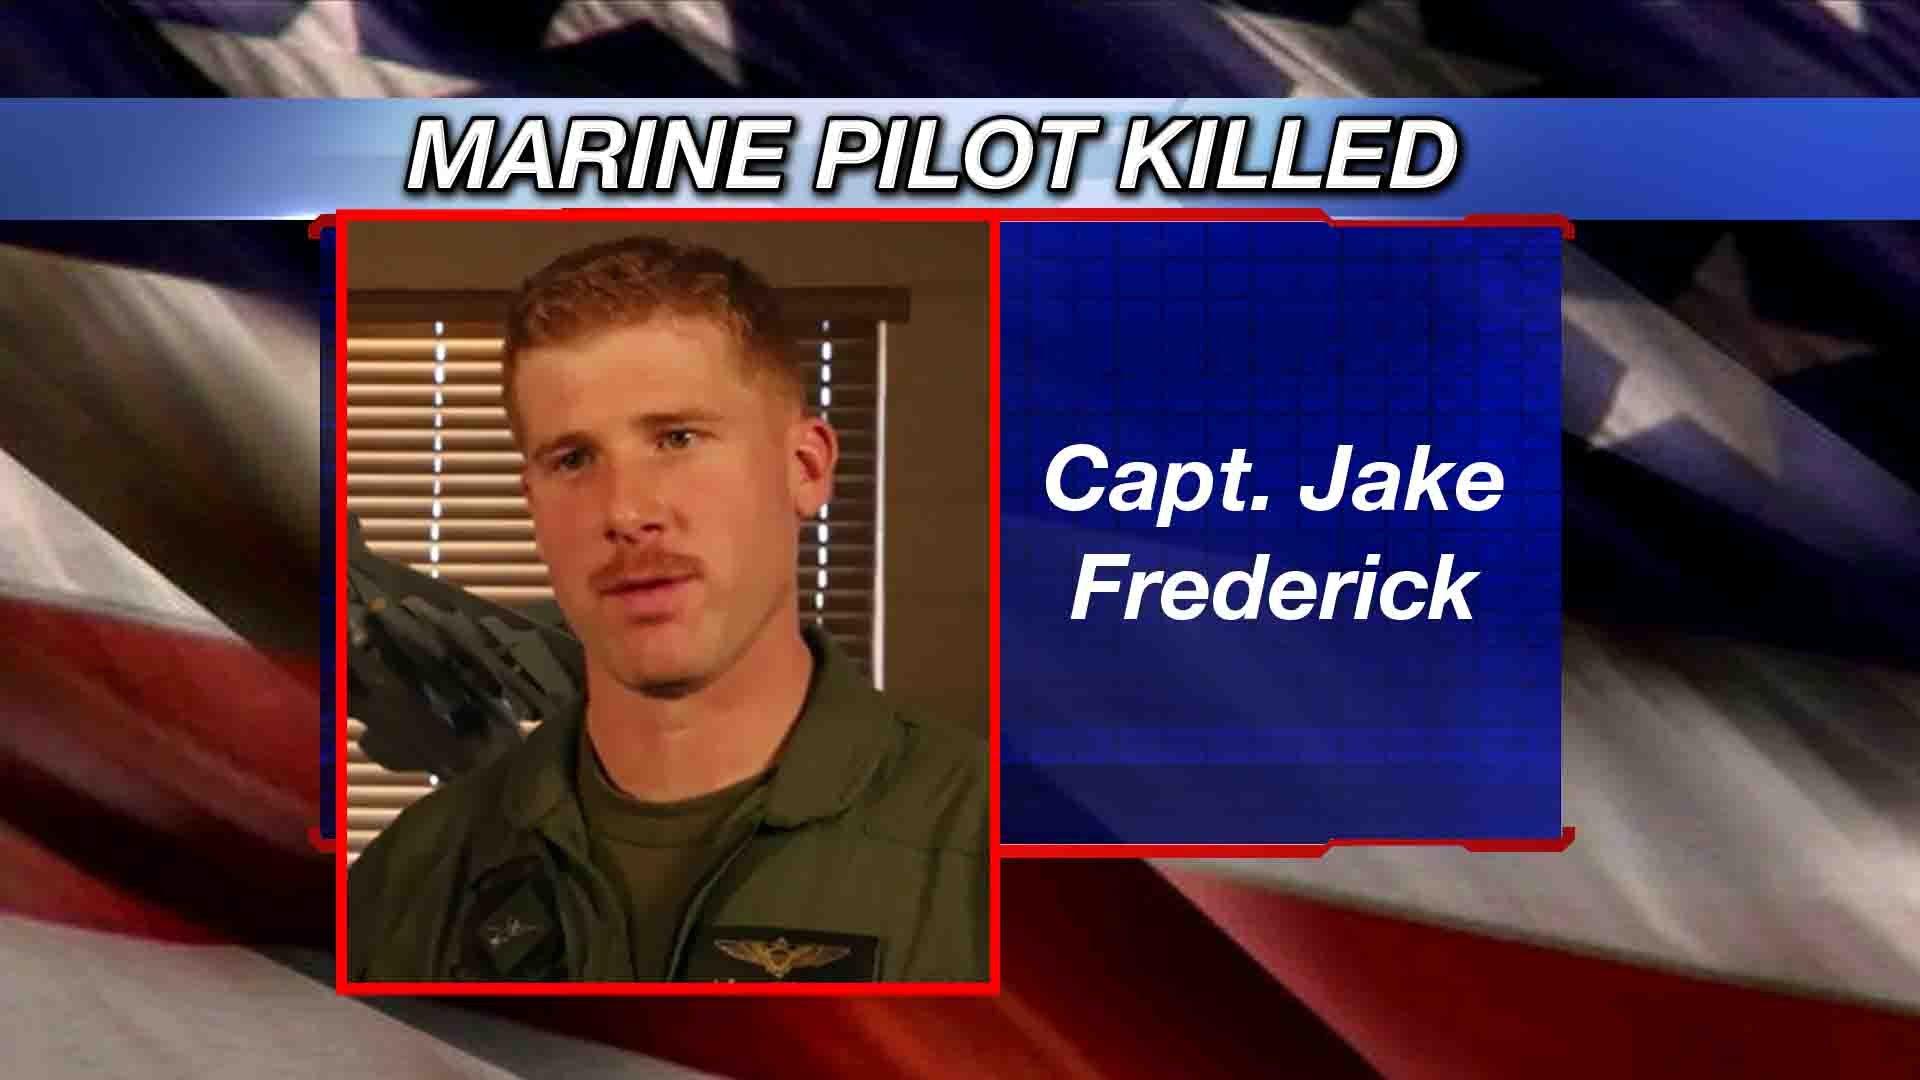 Marine pilot killed in Japan crash identified